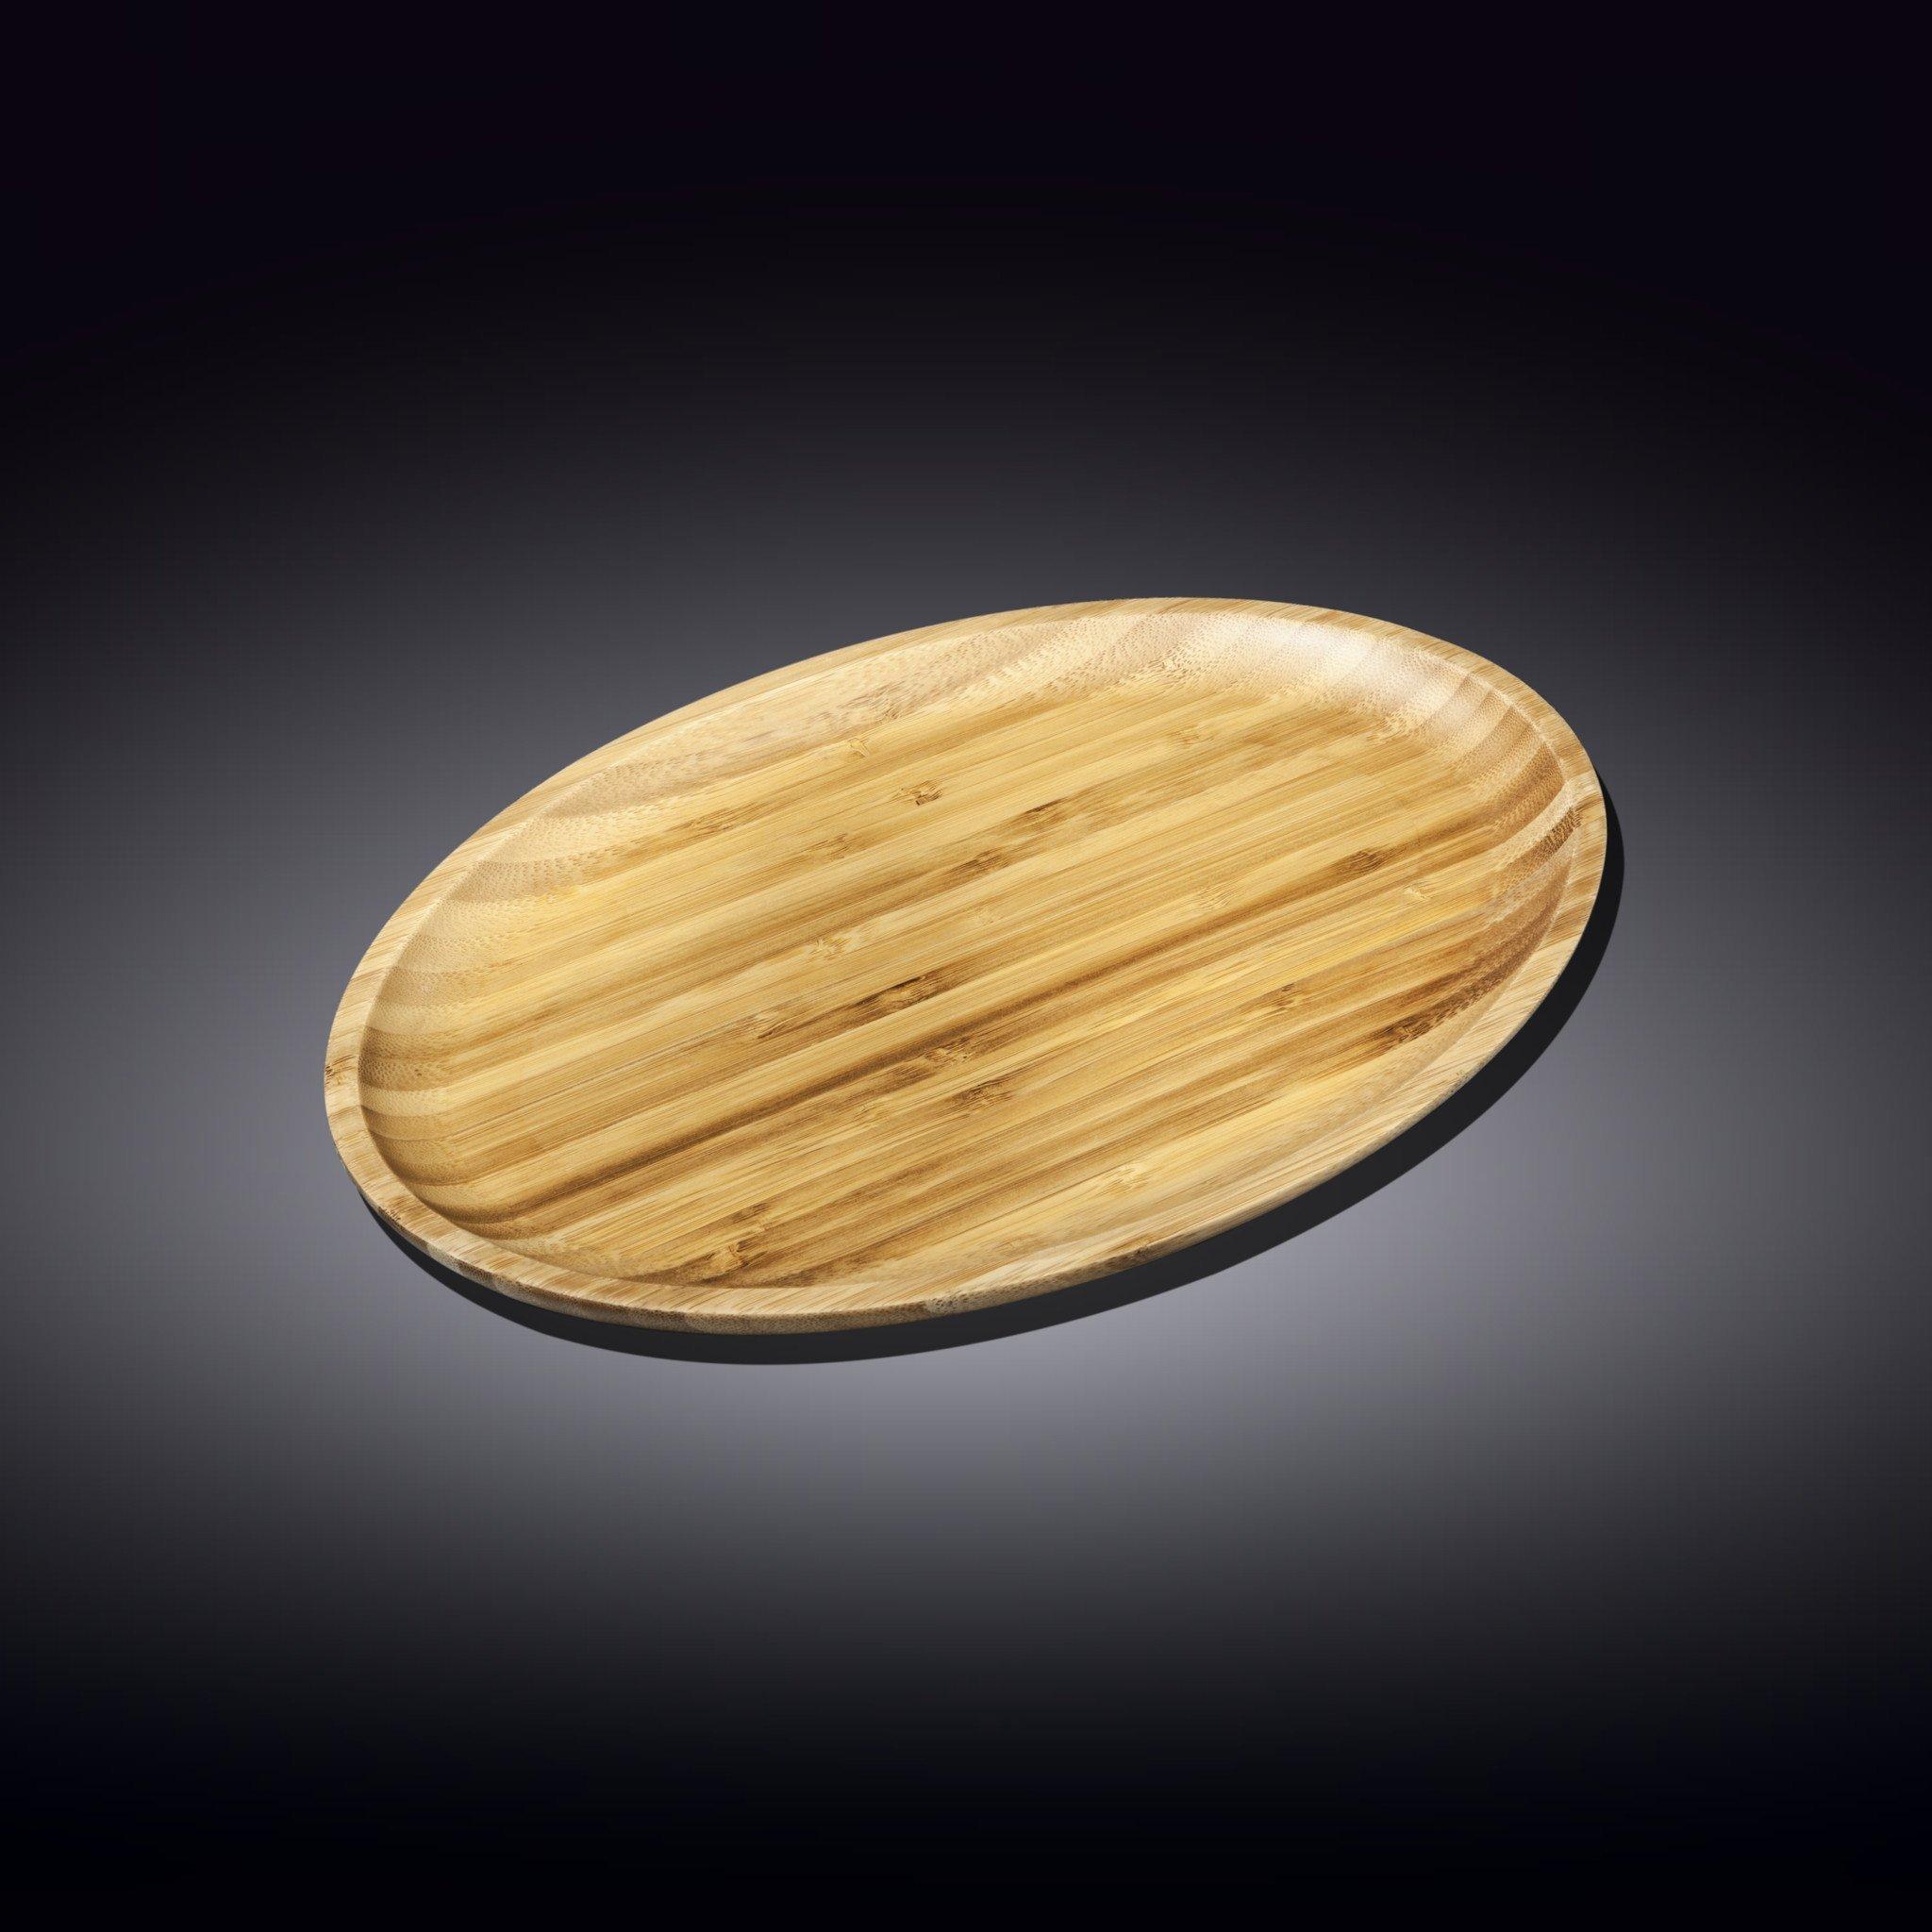 Блюдо 30.5*20.5см Бамбук Wilmax овальное